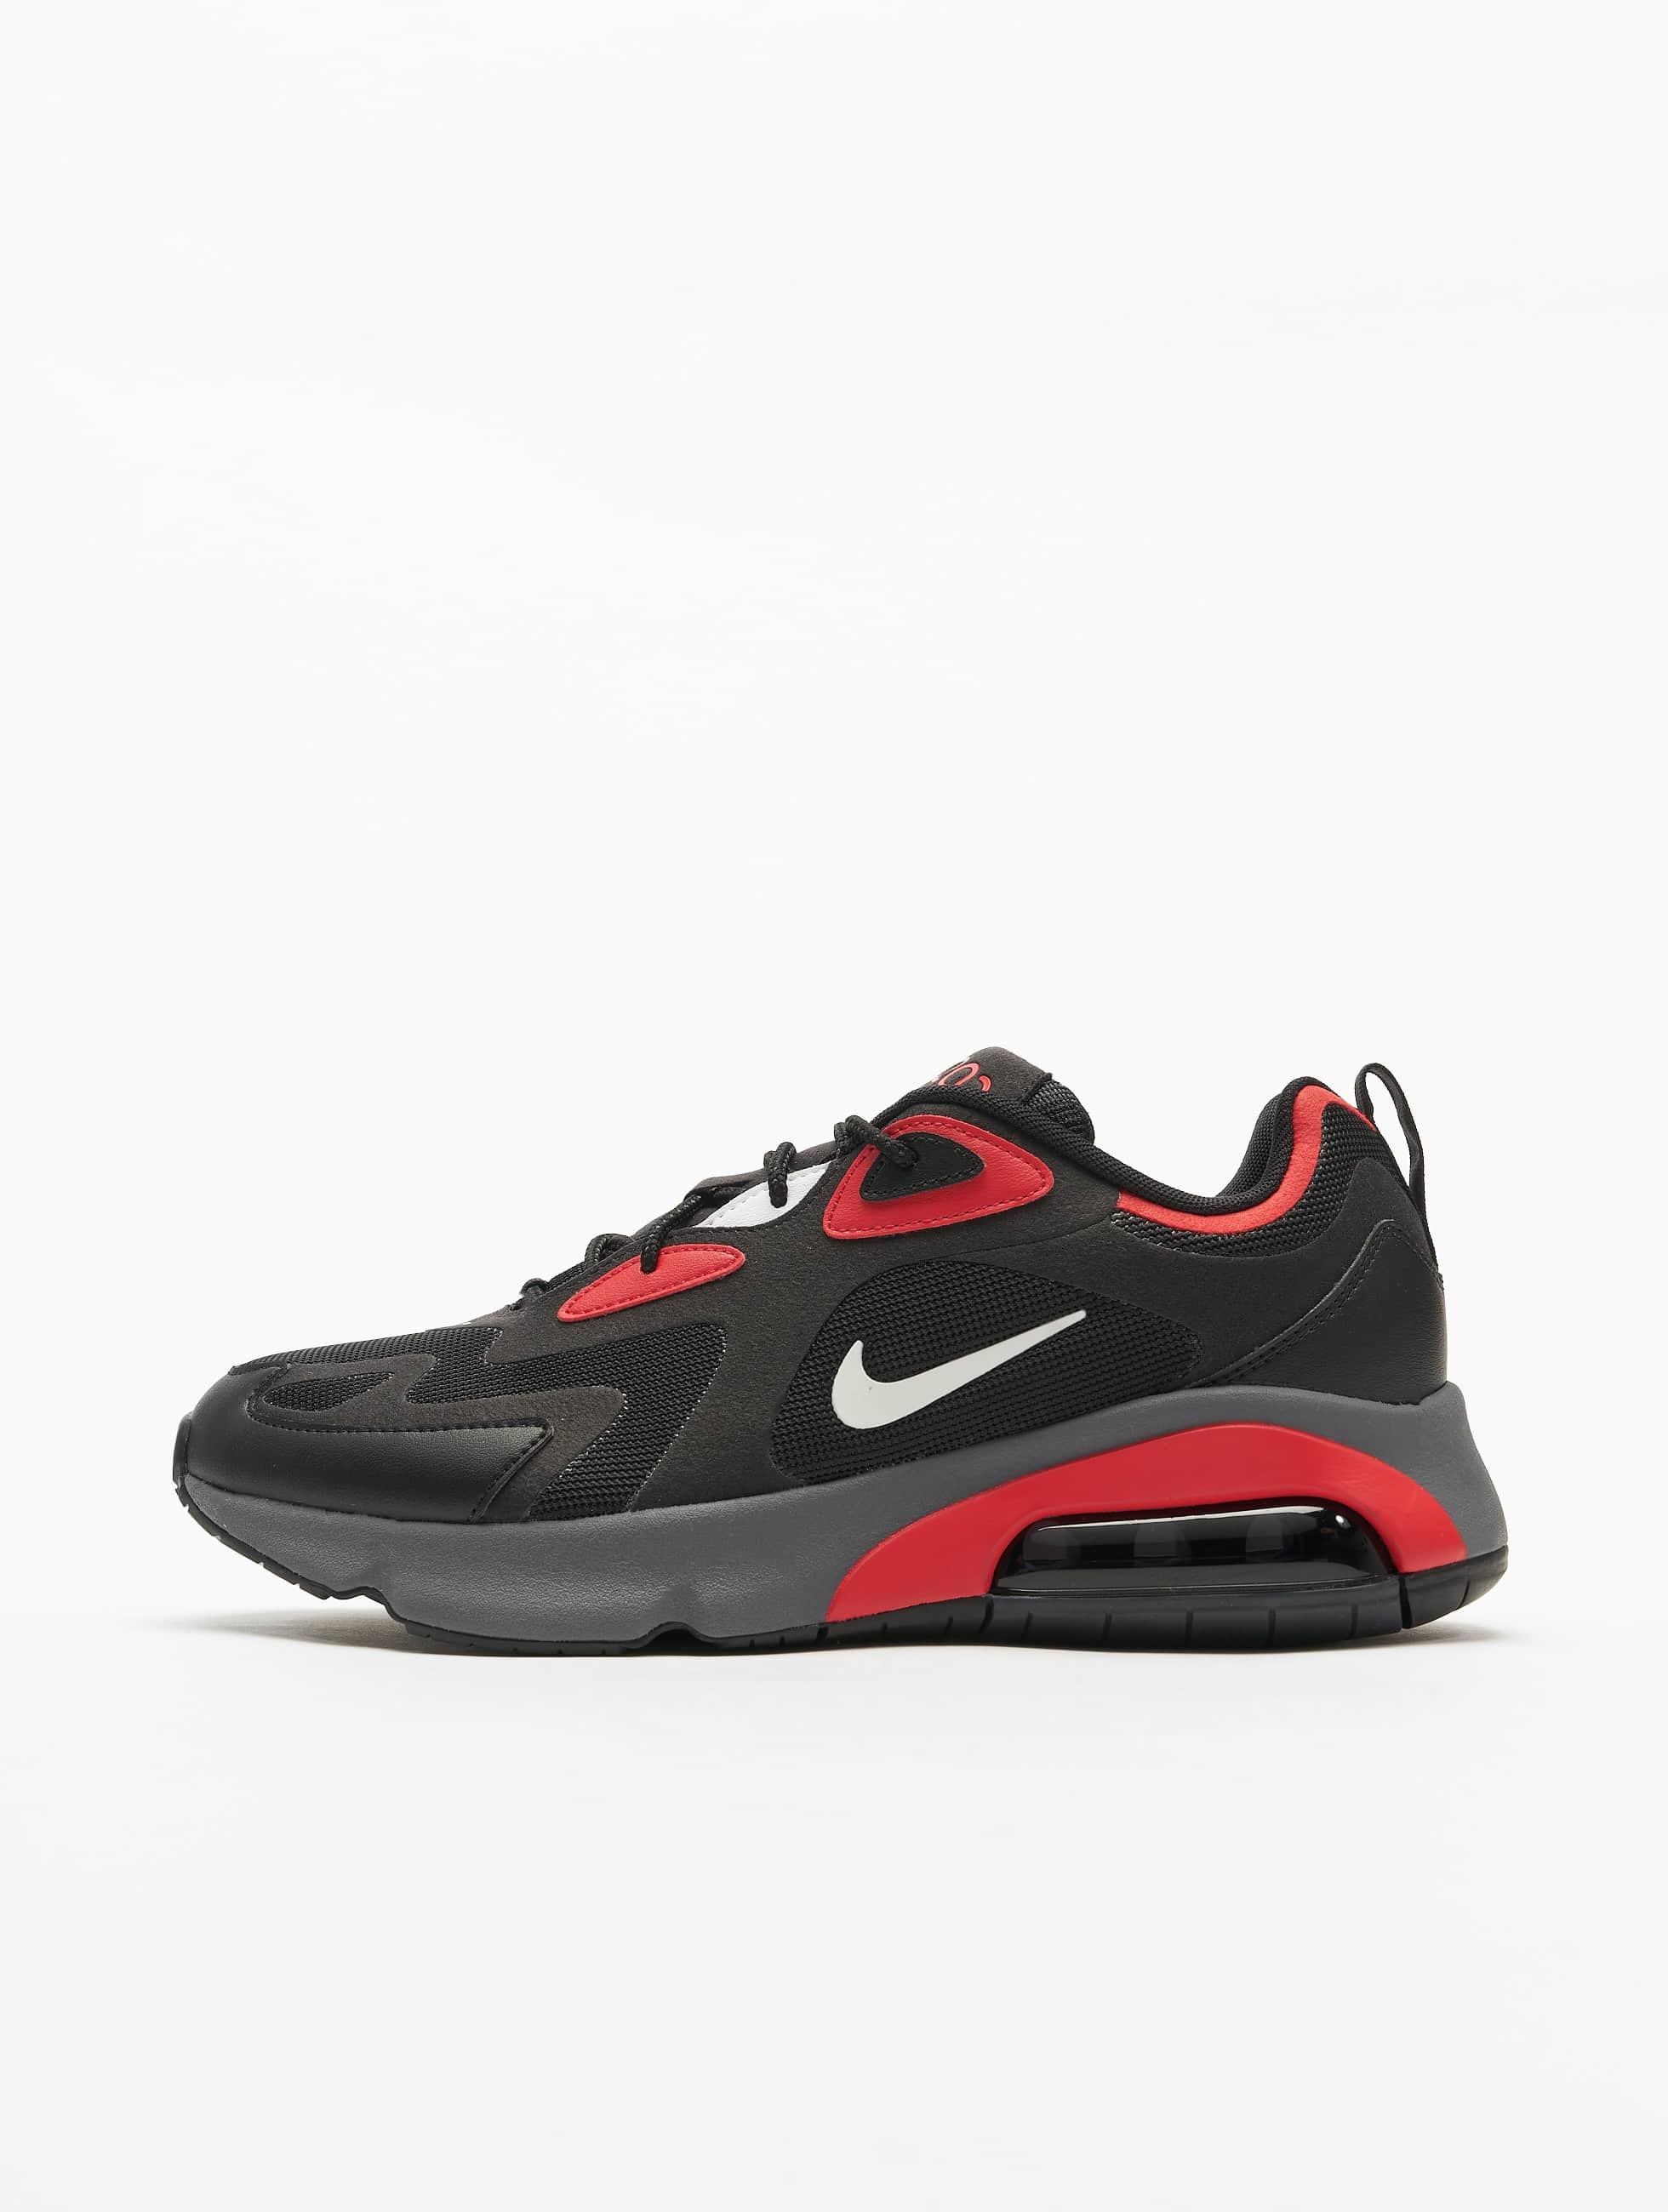 Nike Air Max 200 Sneakers BlackWhiteUniversity RedDark Grey